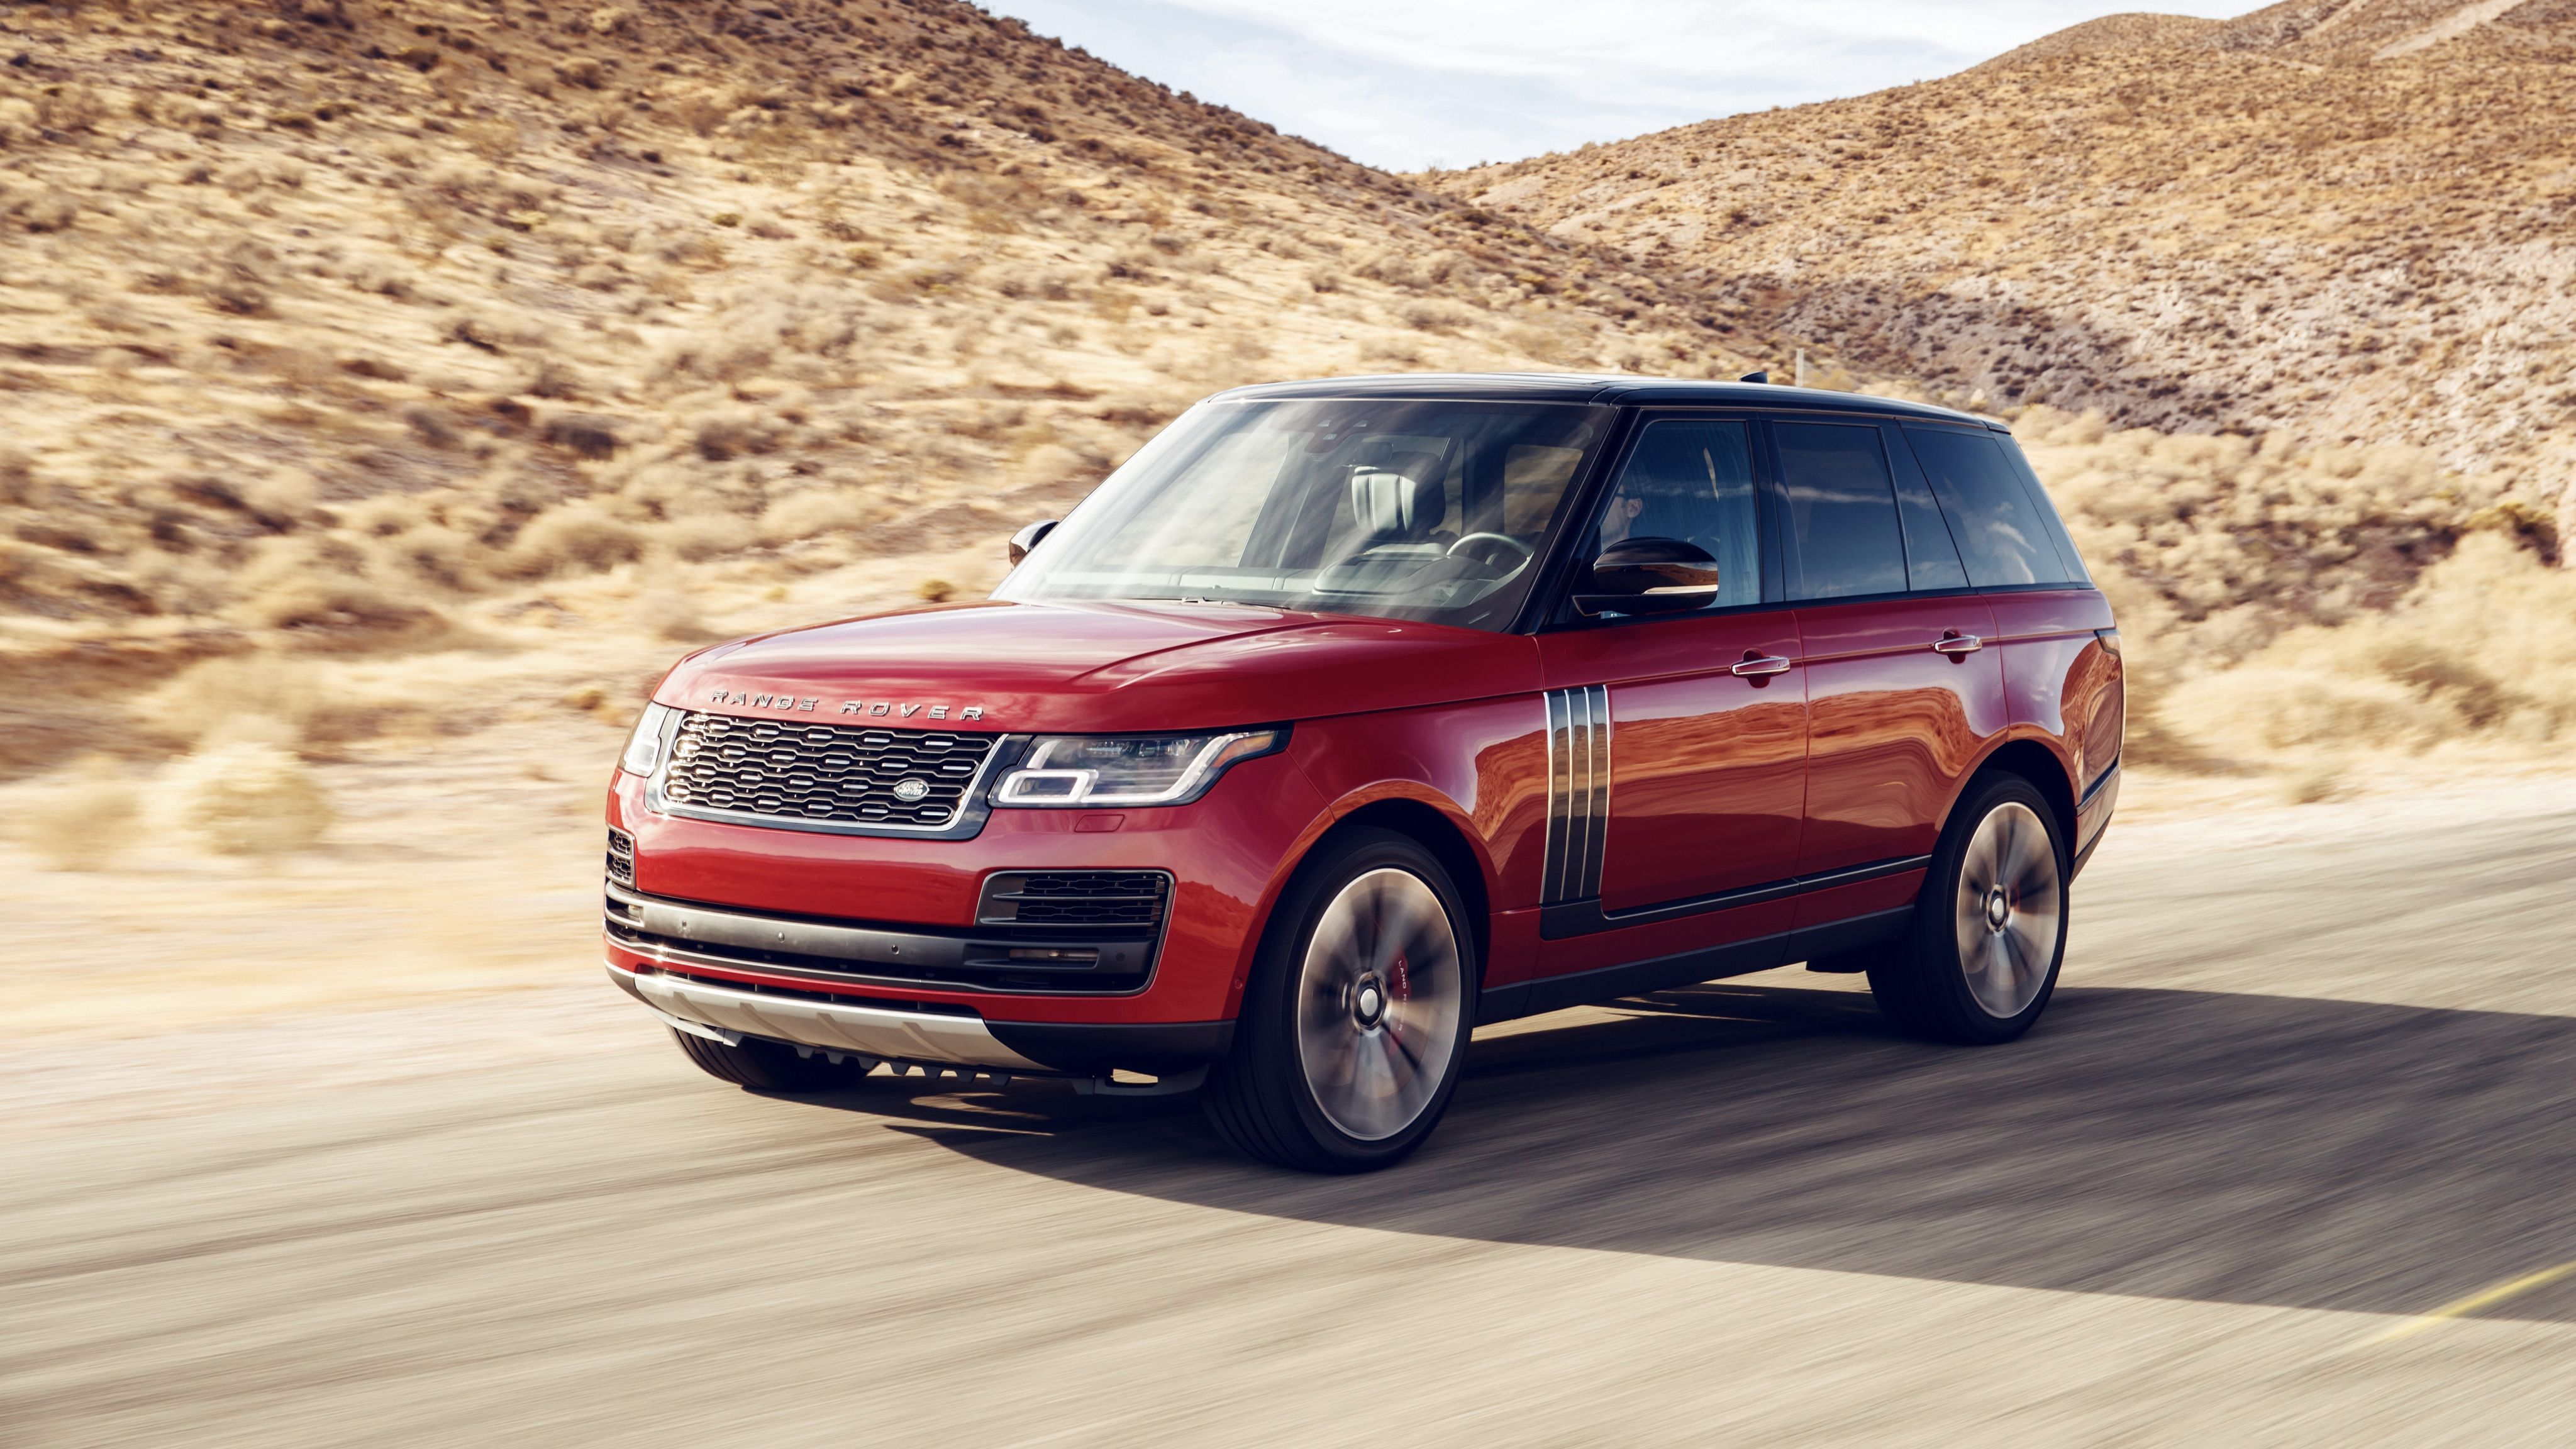 2018 Range Rover Svautobiography Dynamic Range Rover Svautobiography Range Rover Red Range Rover